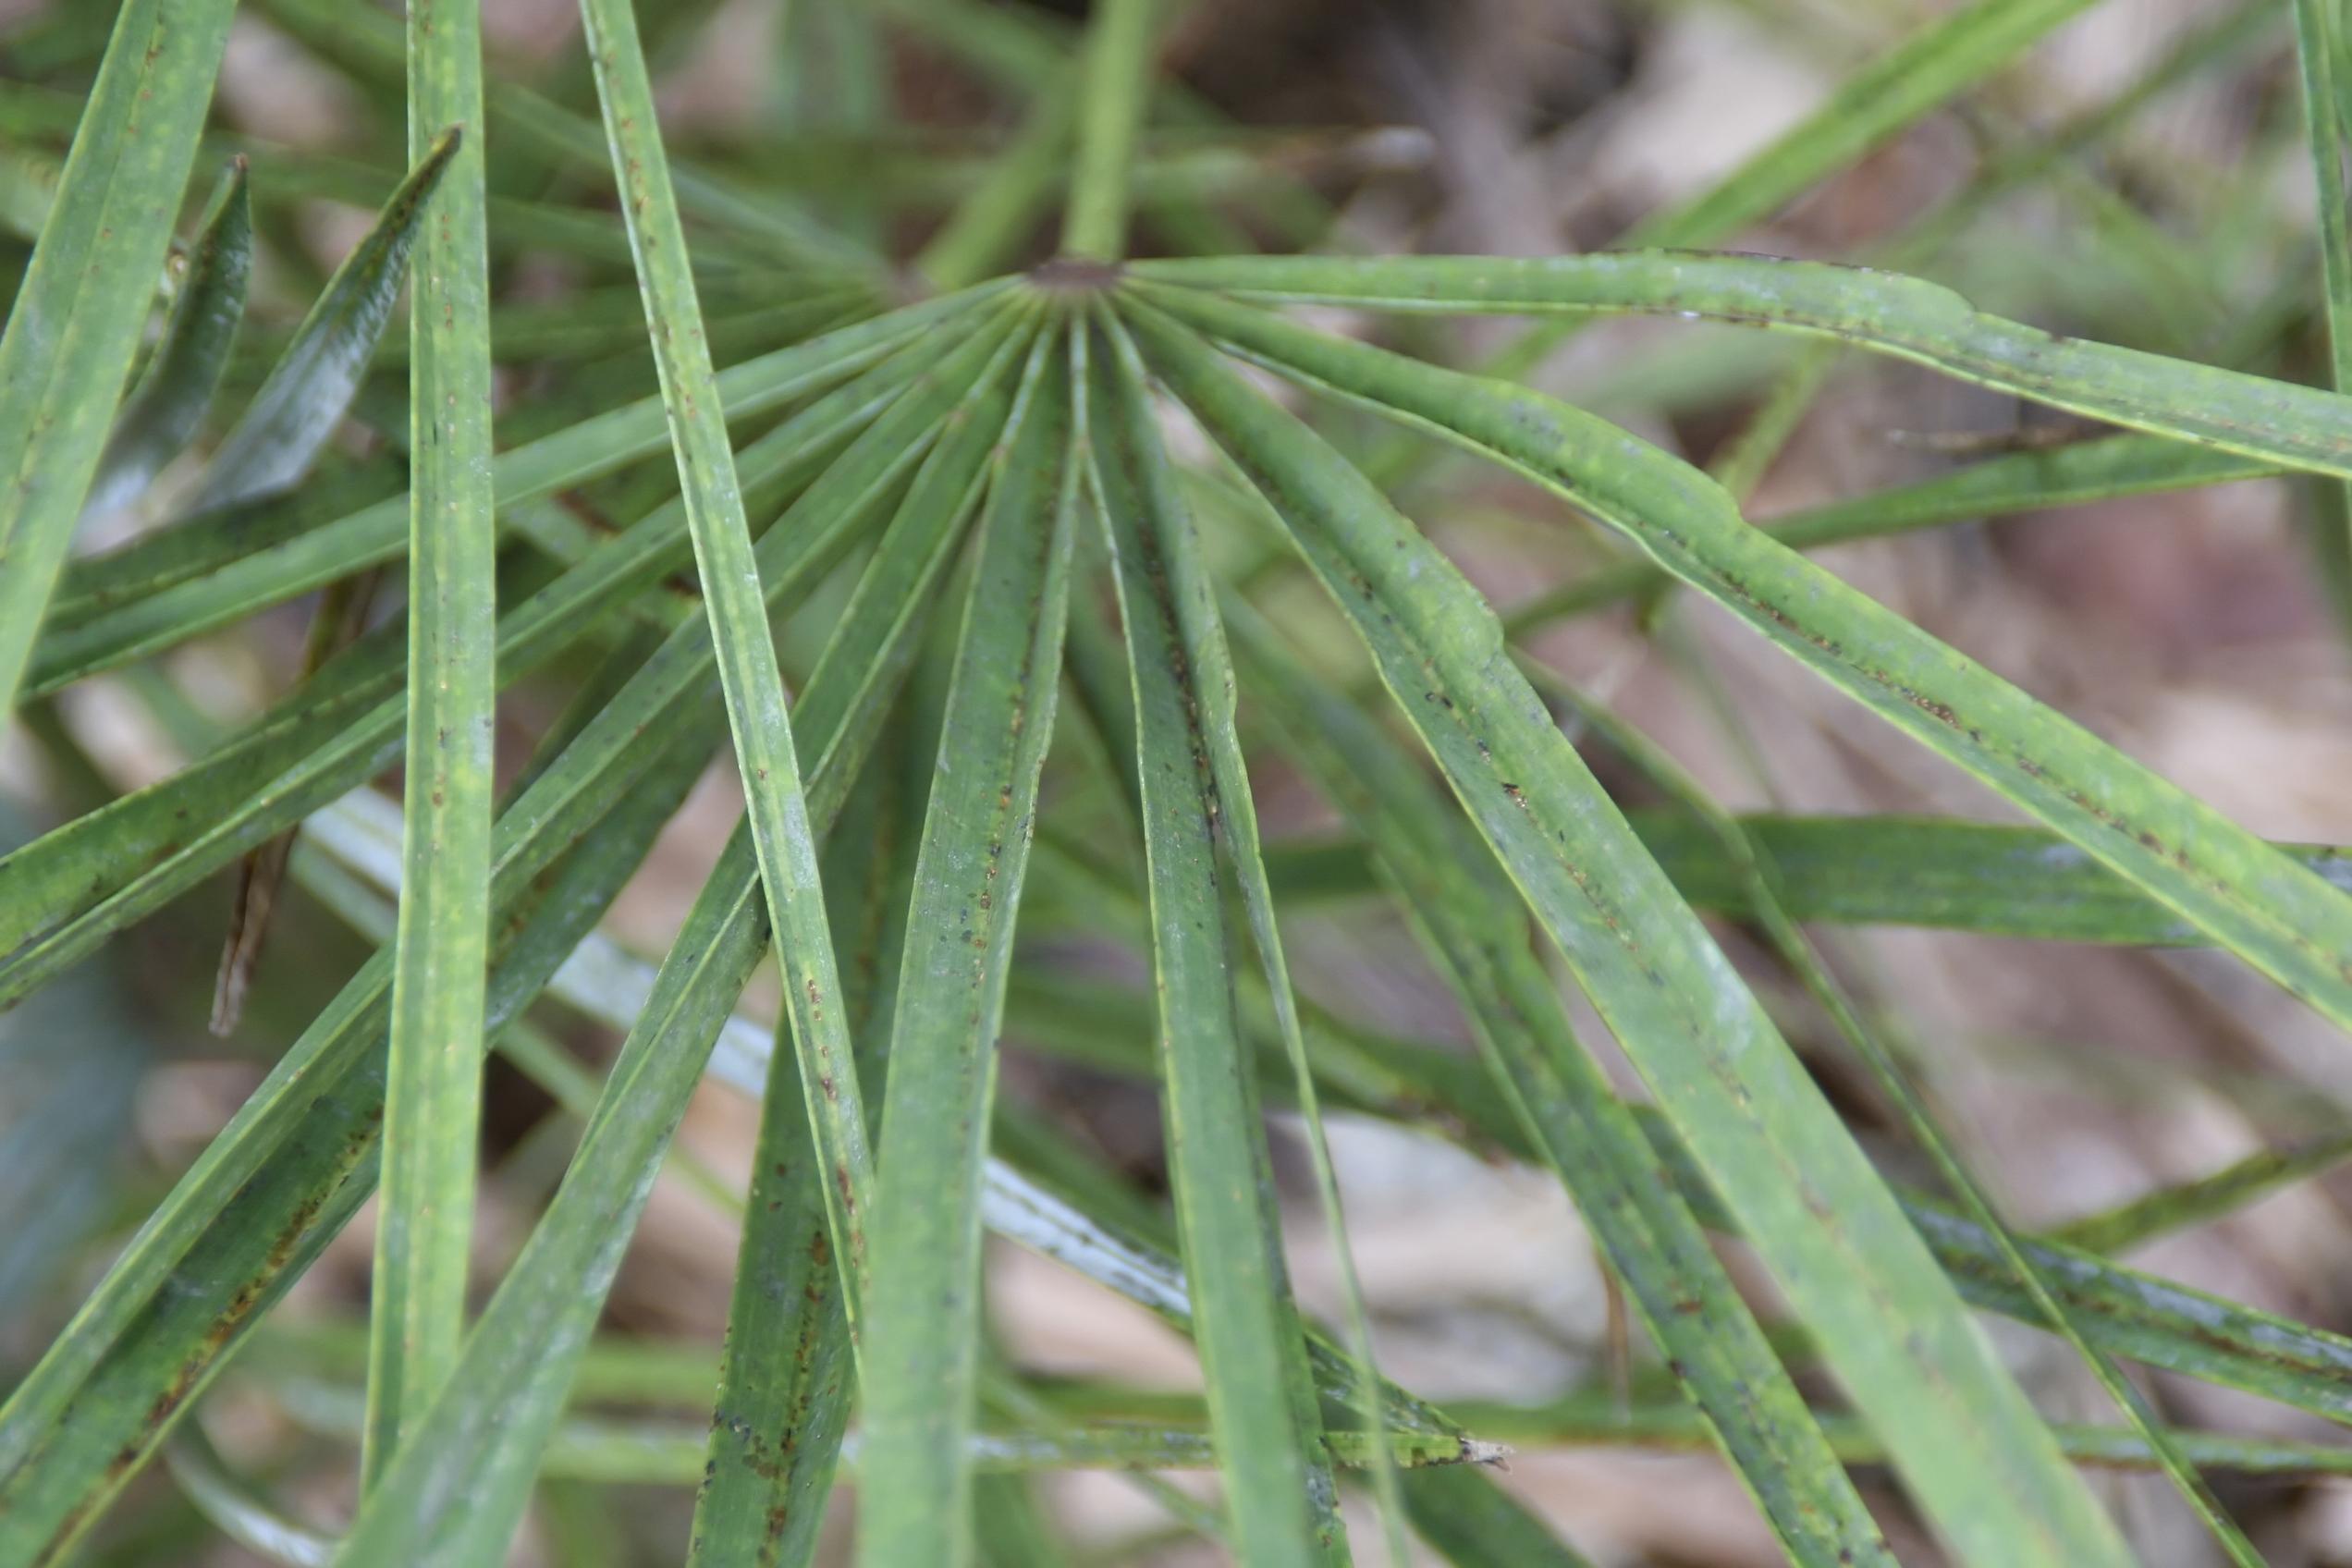 Chamaerops humilis 16zz.jpg English: Location taken: Fairchild Tropical Botanic Garden, Miami, FL USA. Names: Chamaerops humilis L., Cefaglioni